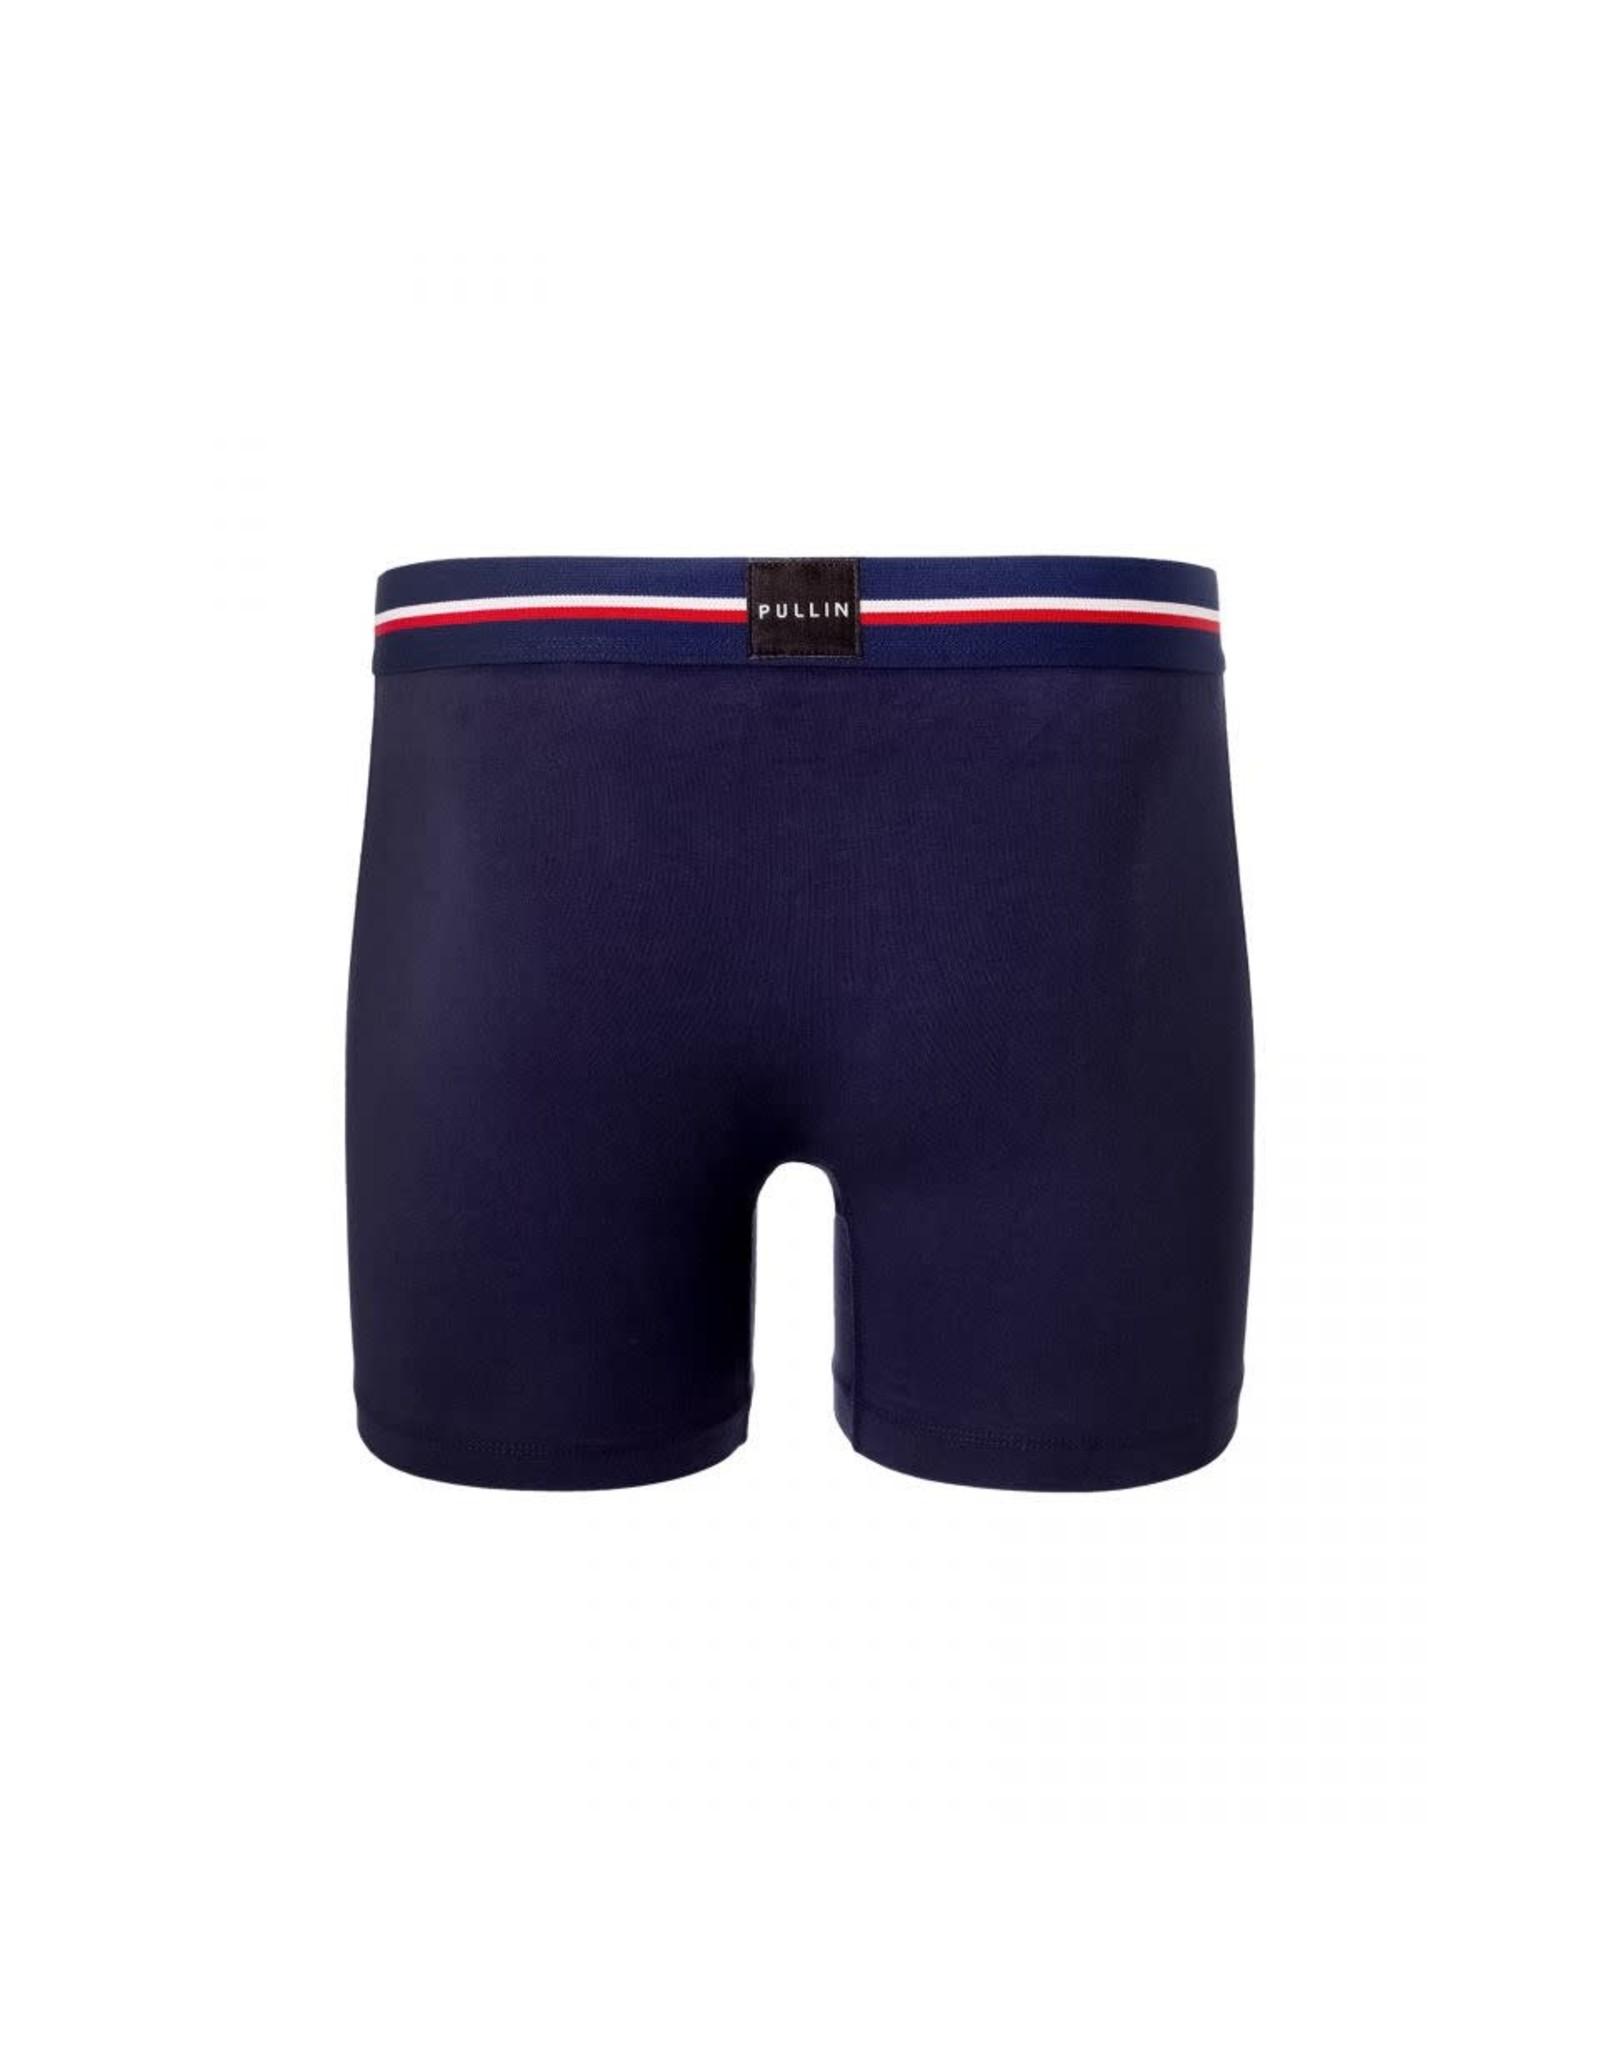 Pullin Sous-vêtement coton Pullin bleu Fashion